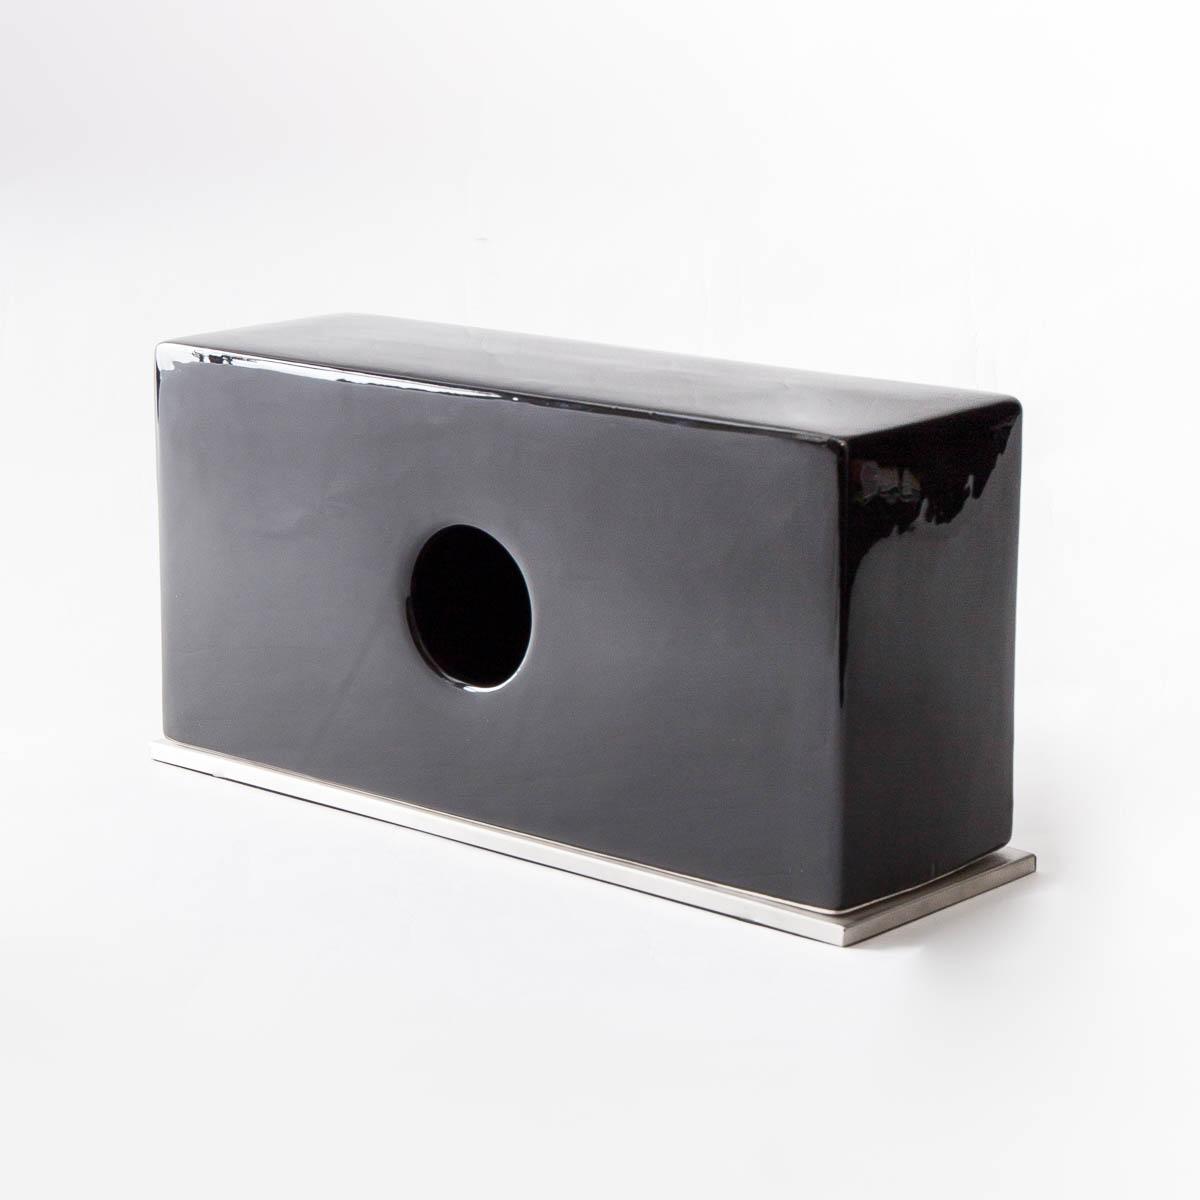 b2c お気に入り セラミック ティッシュスタンド ブラック ティッシュケース ボックス#SL_BT ティッシュカバー 永遠の定番 ポケットティッシュ